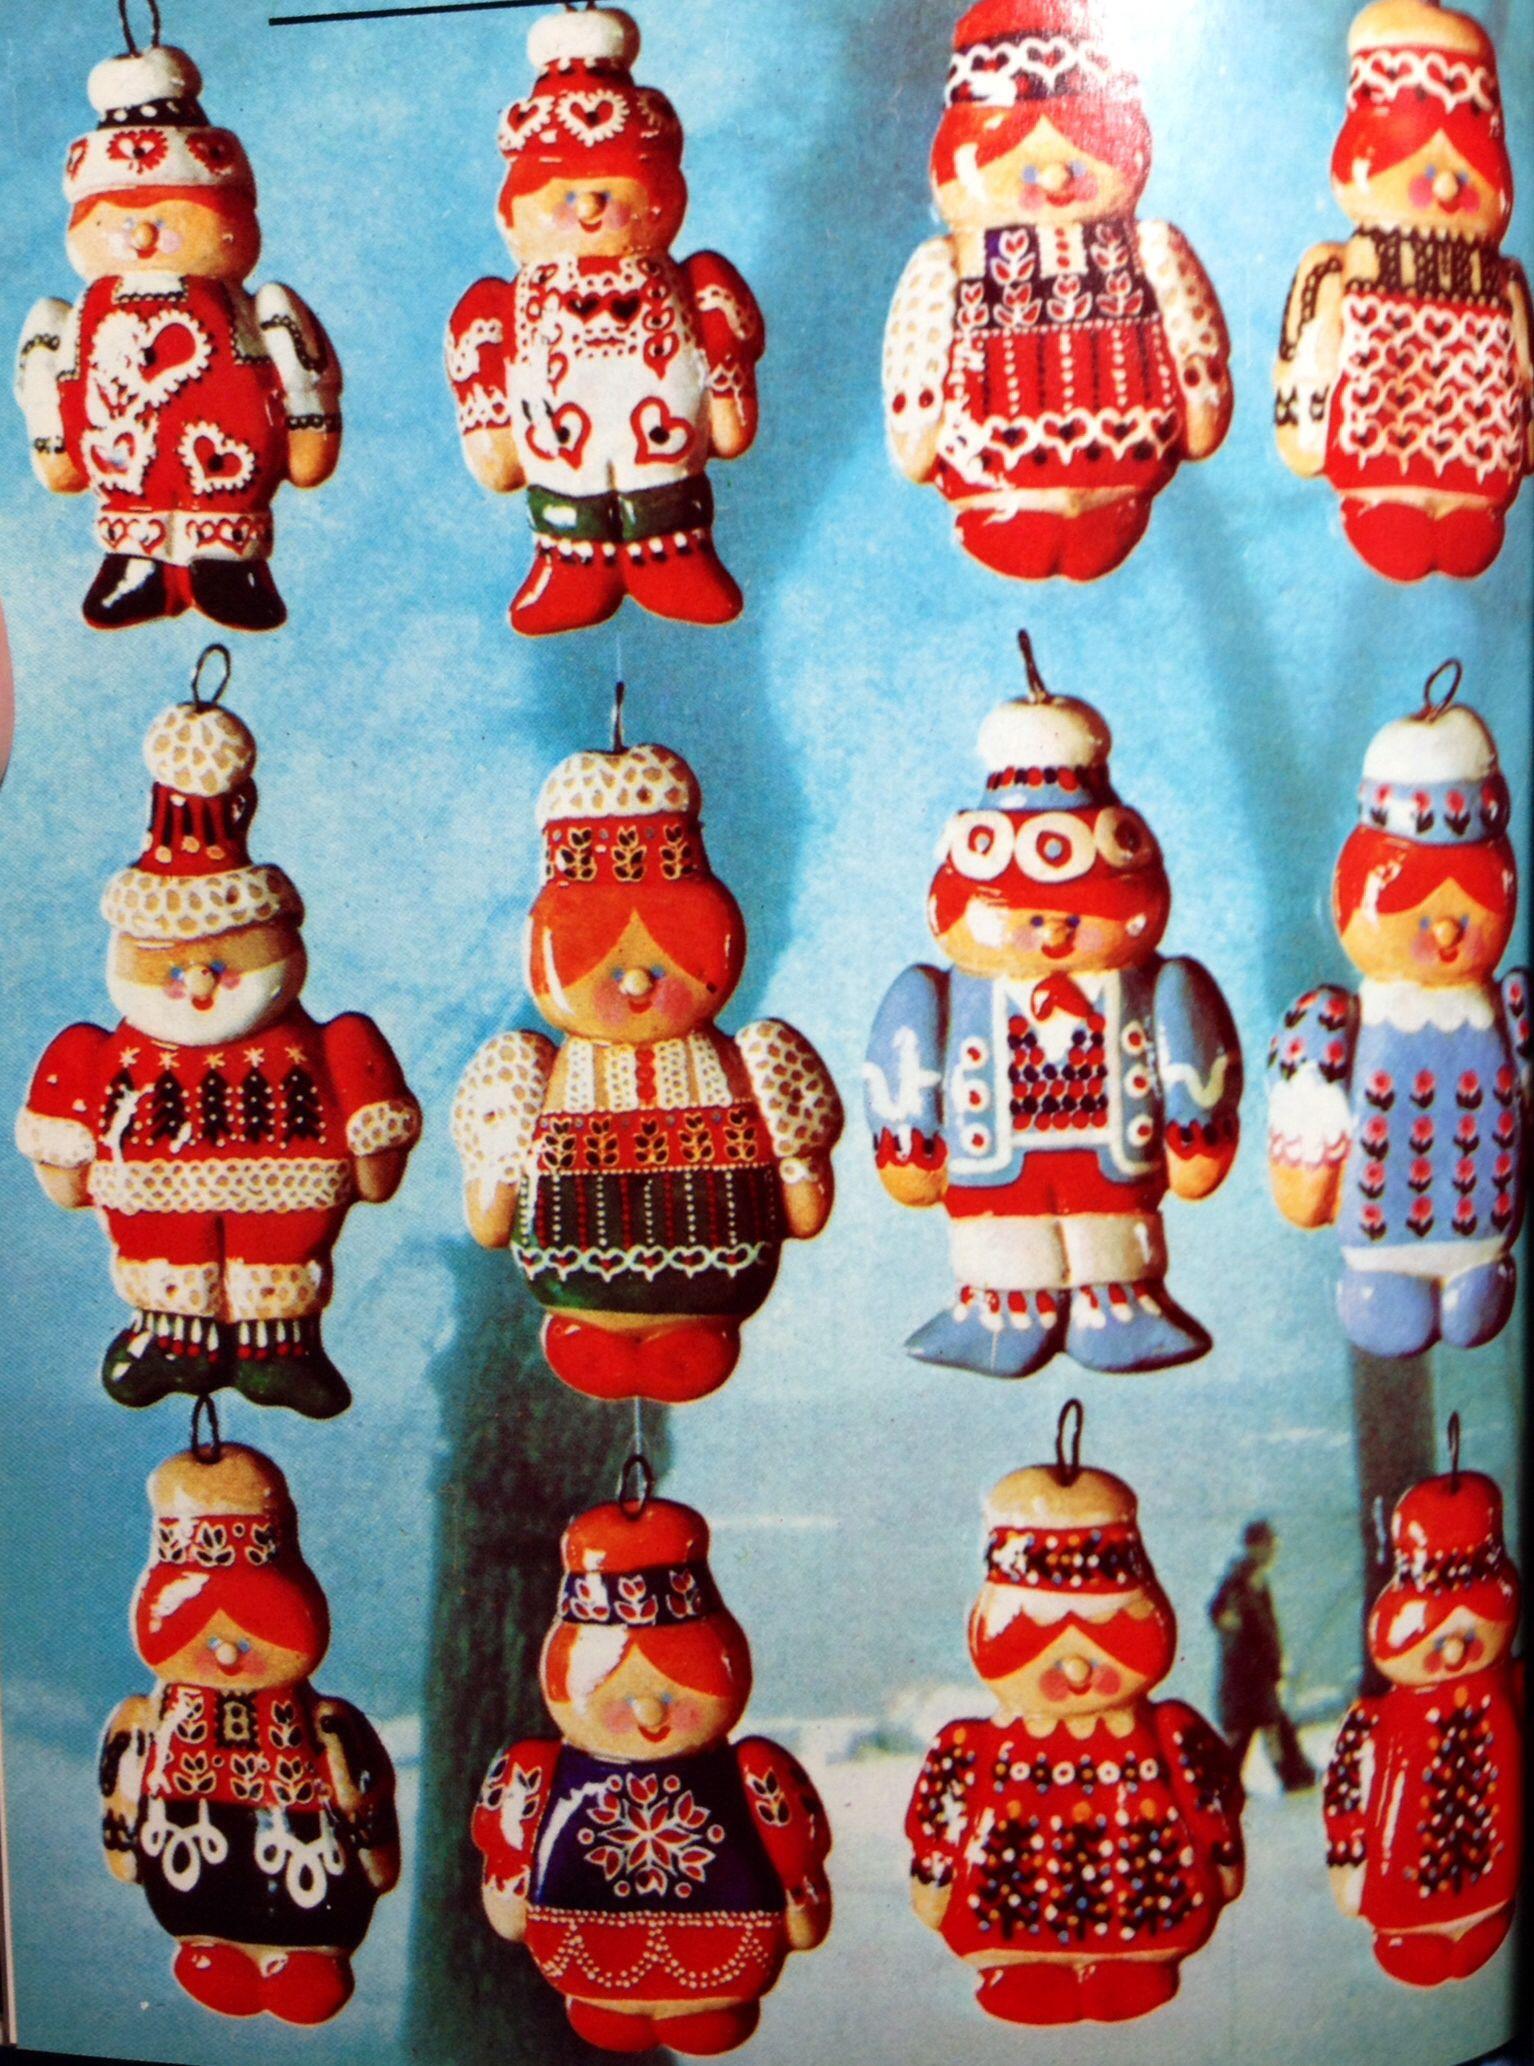 Adorable Dough Art People Christmas Ornaments Could Use Salt Dough, No  Crust White Bread